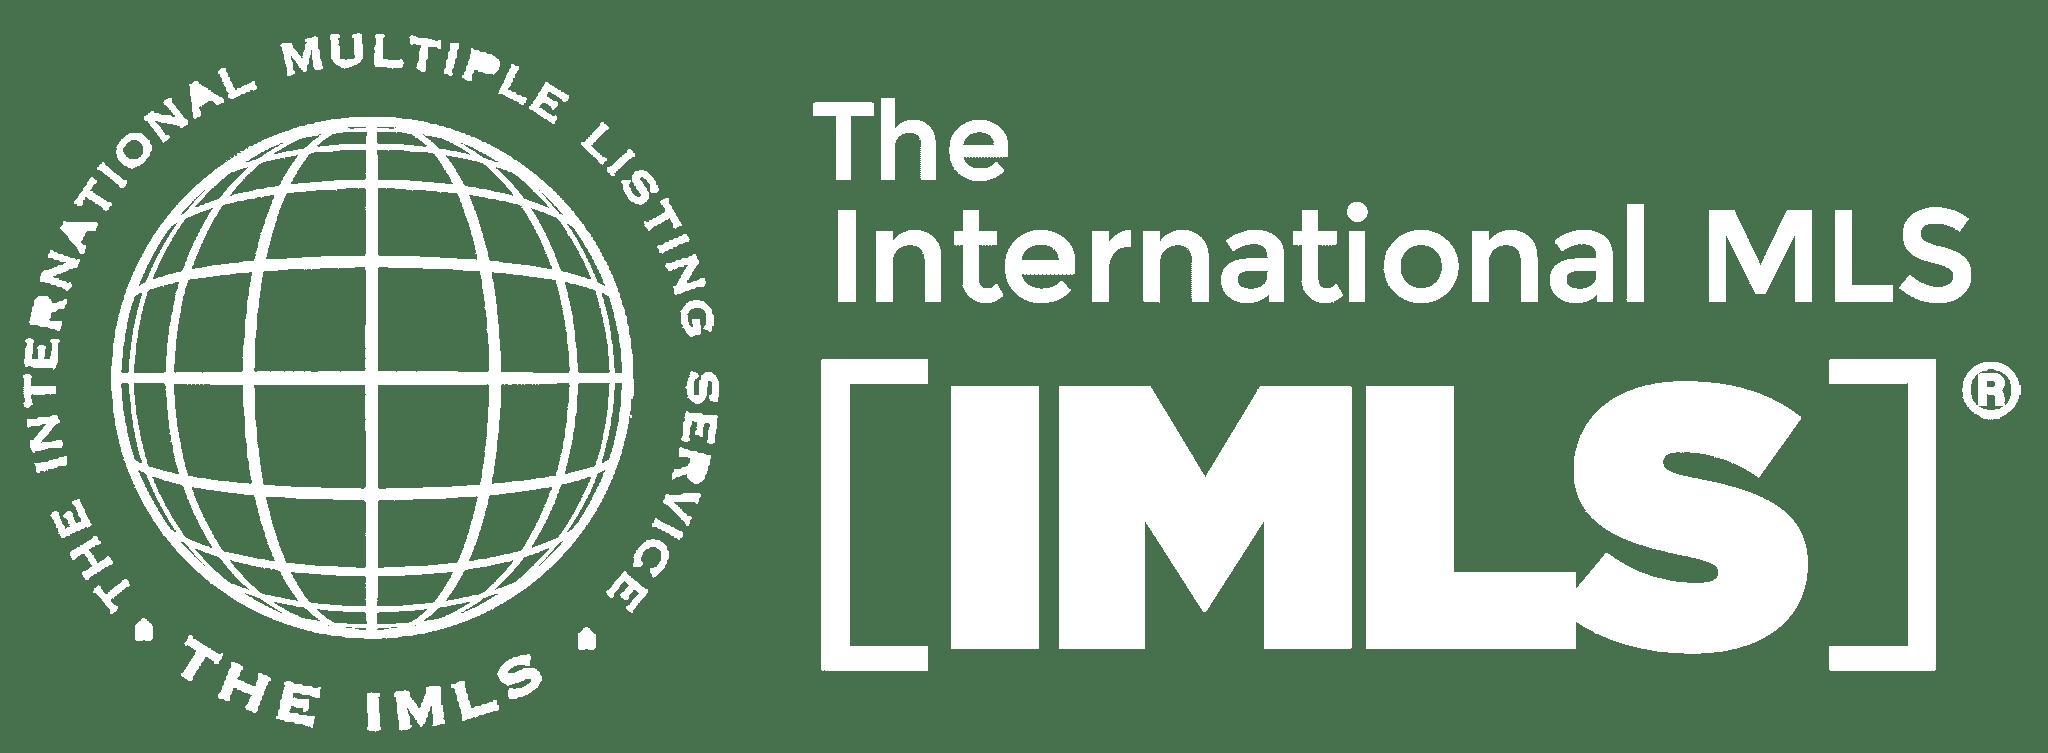 the international mls imls mls international mls real estate search world s first international multiple listing service the international mls imls mls